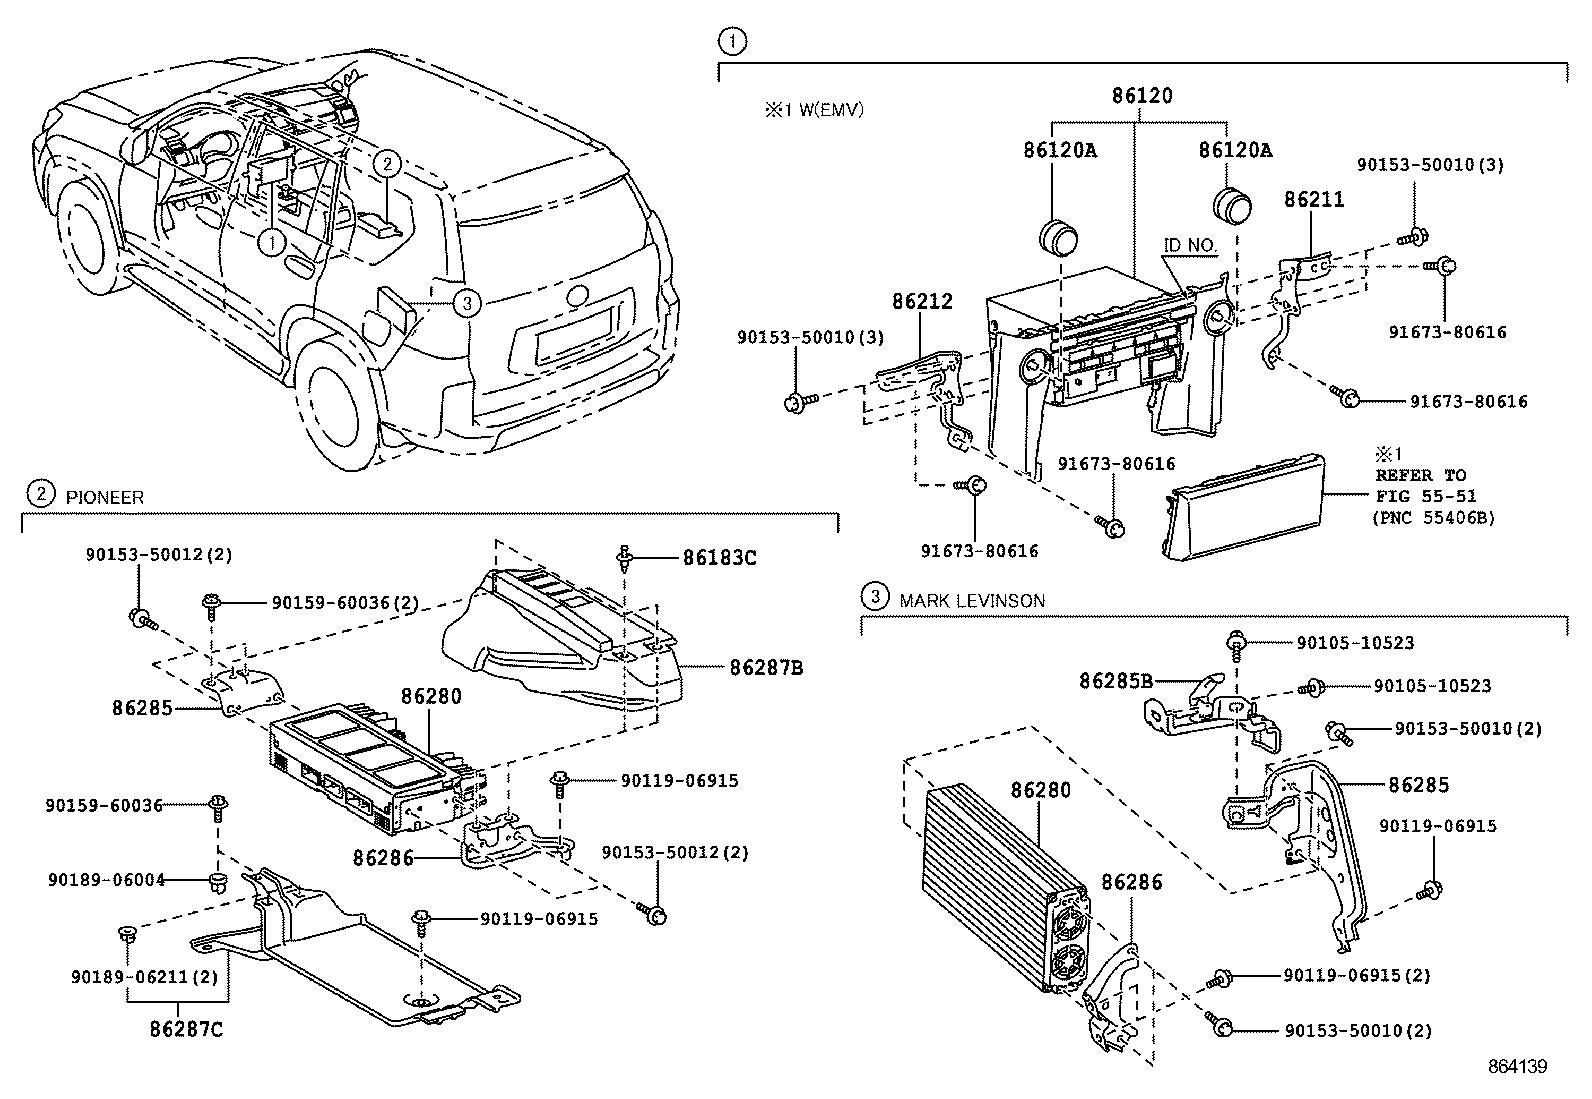 Lexus Gx 460 2010 4x4 | Wiring Diagram Database